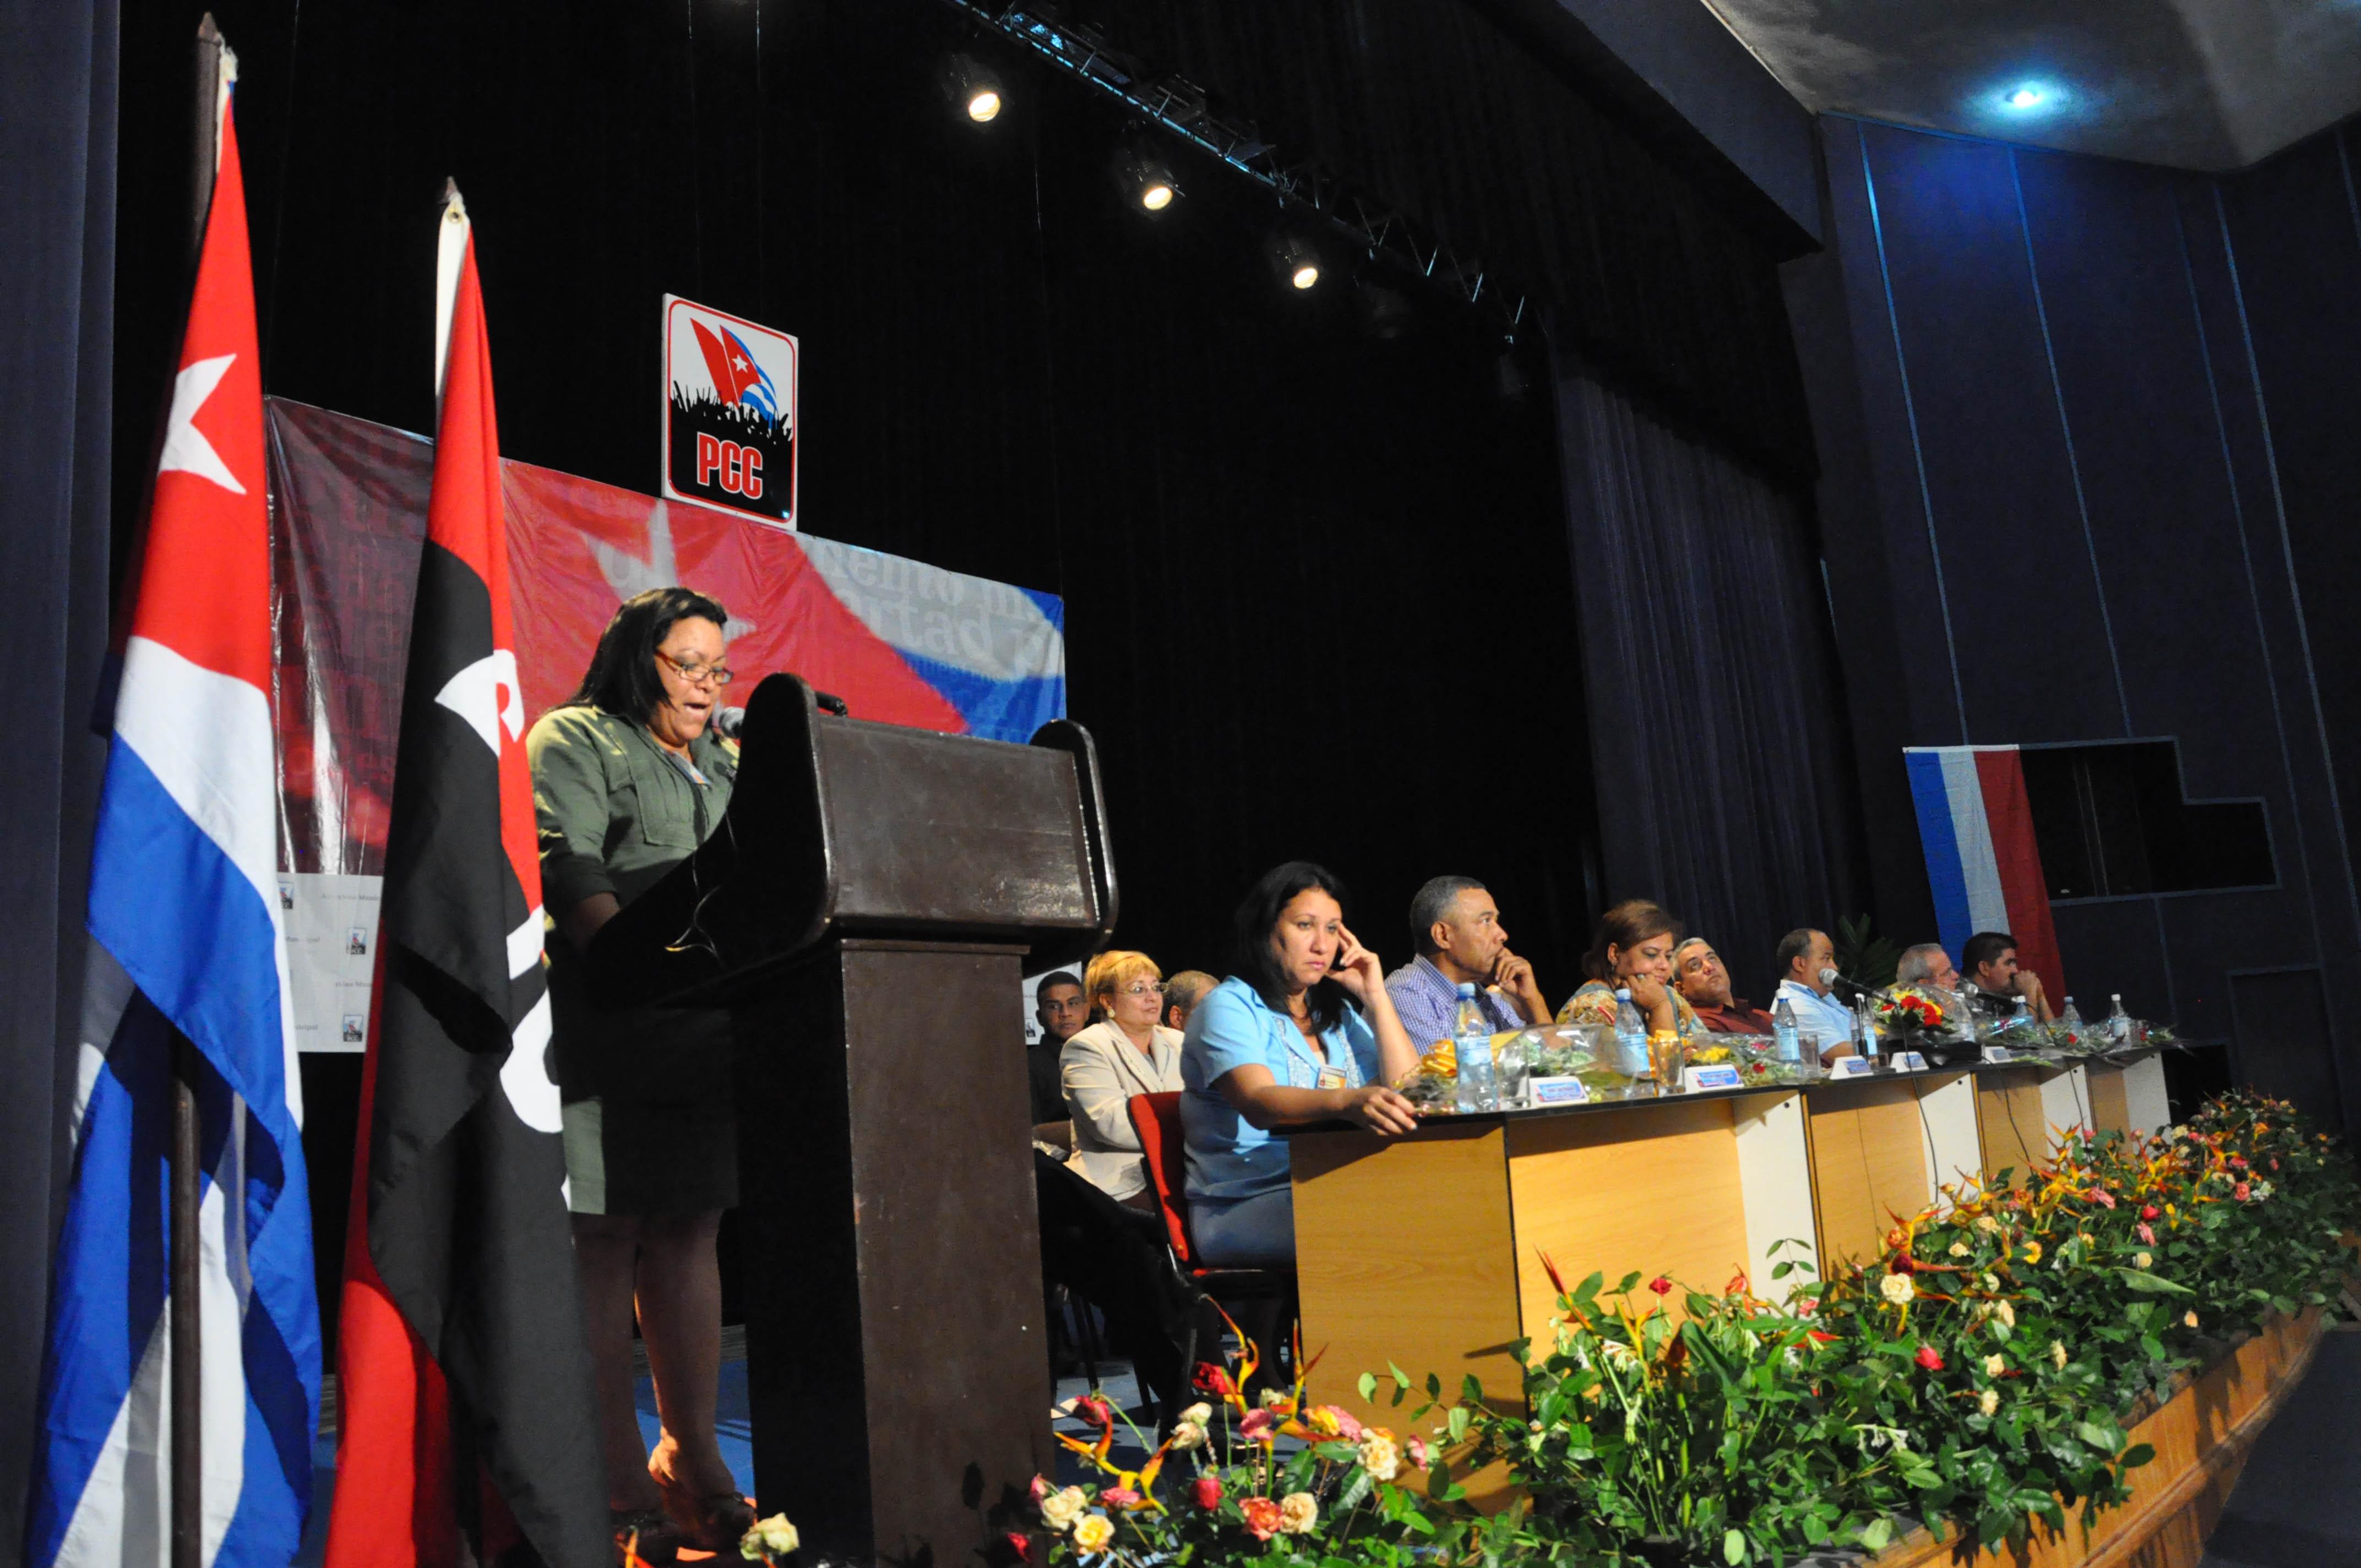 Asamblea del PCC, Bayamo